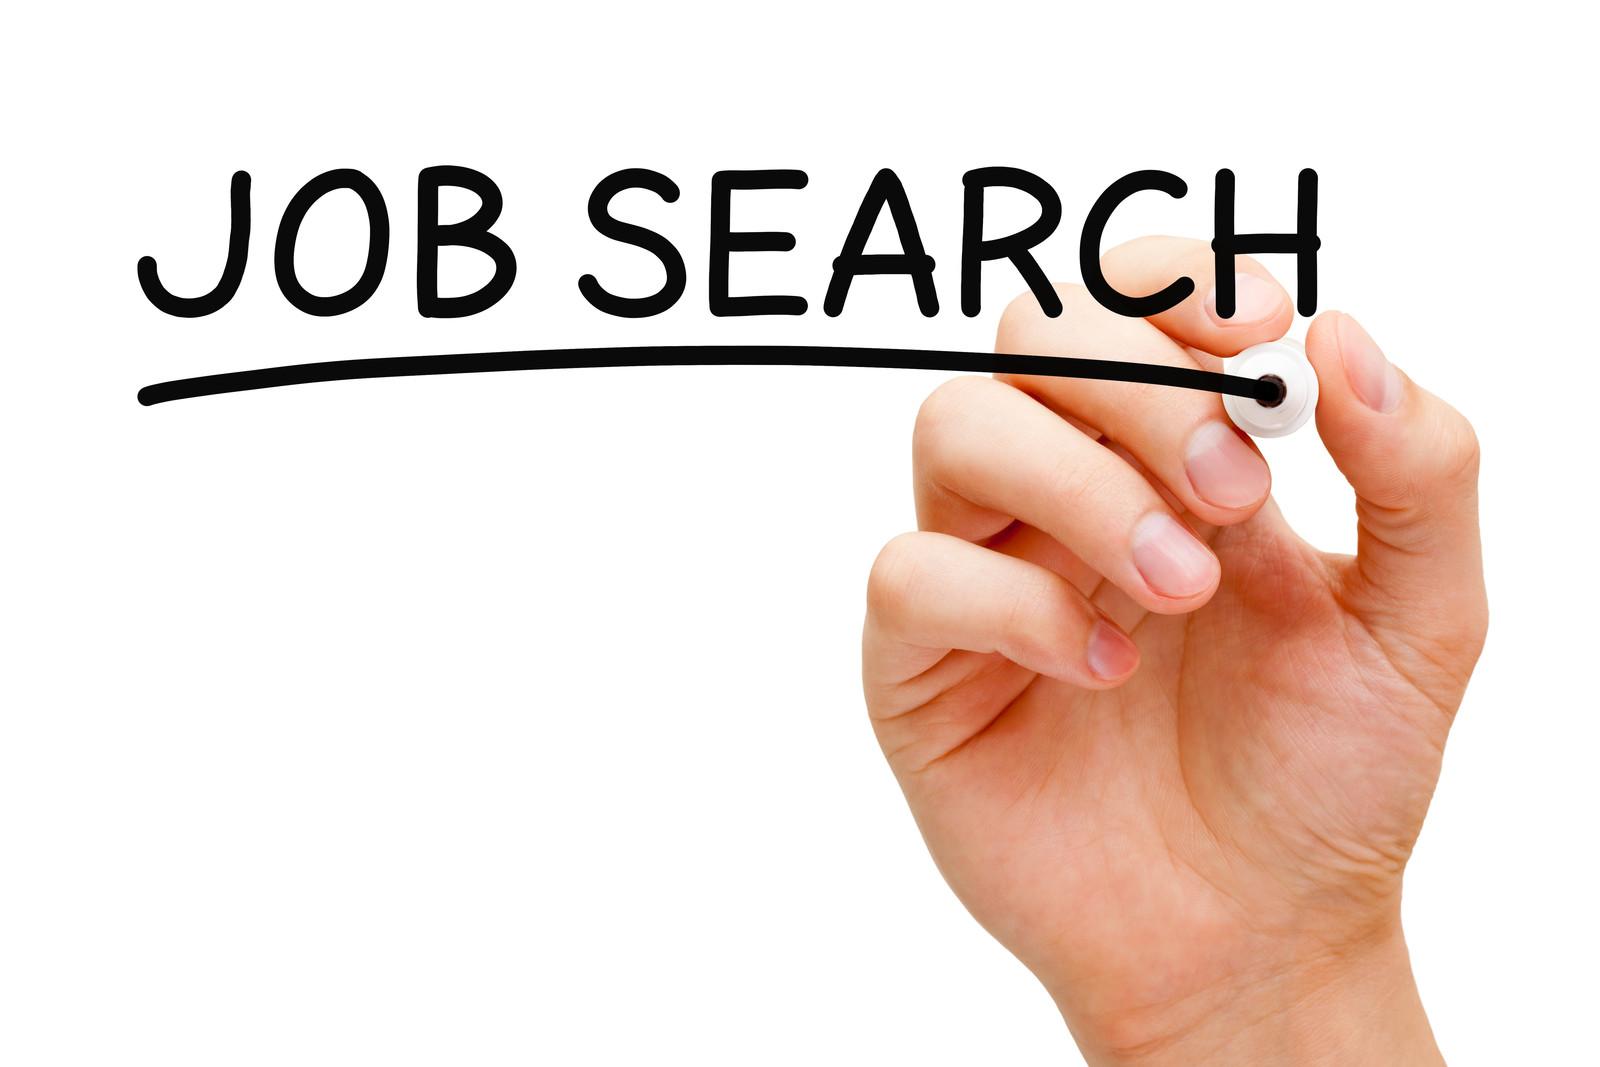 cannabis job, how to get a cannabis job, cannabis training university reviews, cannabis job, budtender jobs, cannabis careers